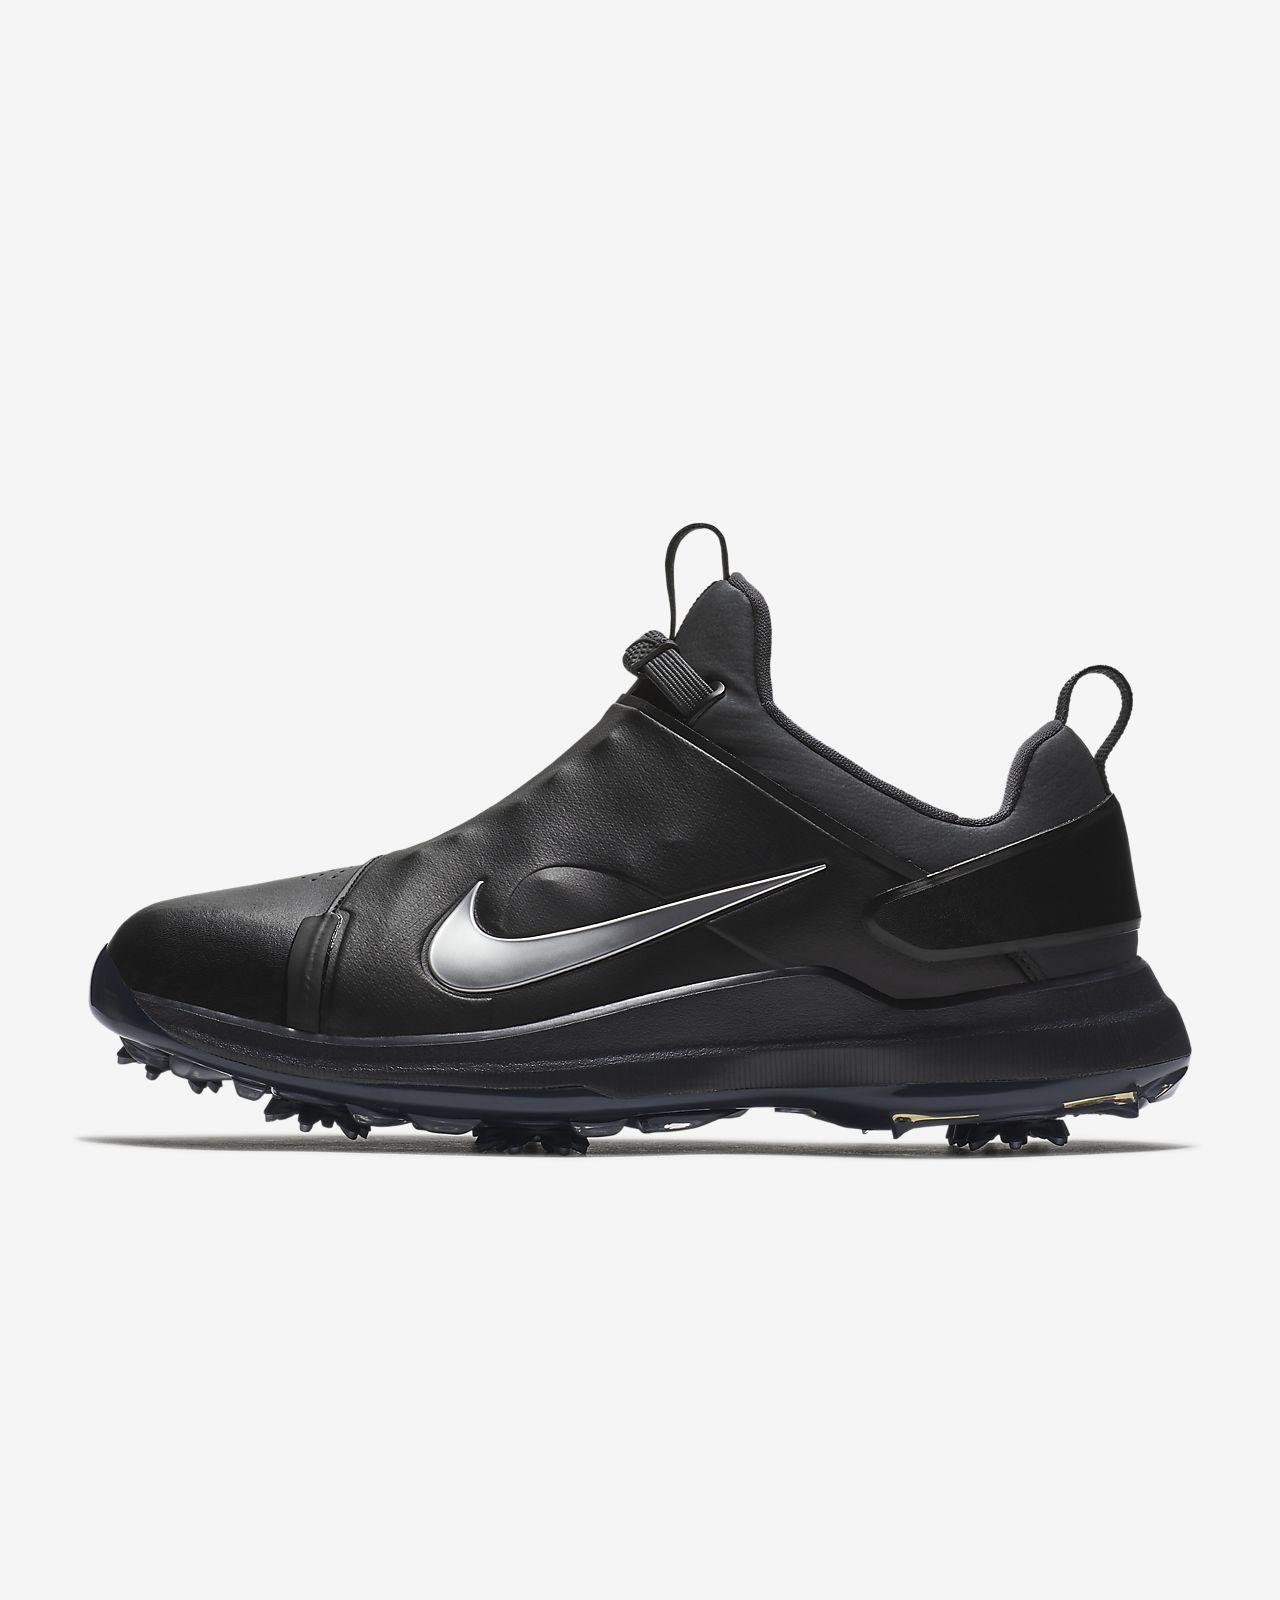 a1356b43f328 Мужские кроссовки для гольфа Nike Golf Tour Premiere. Nike.com RU